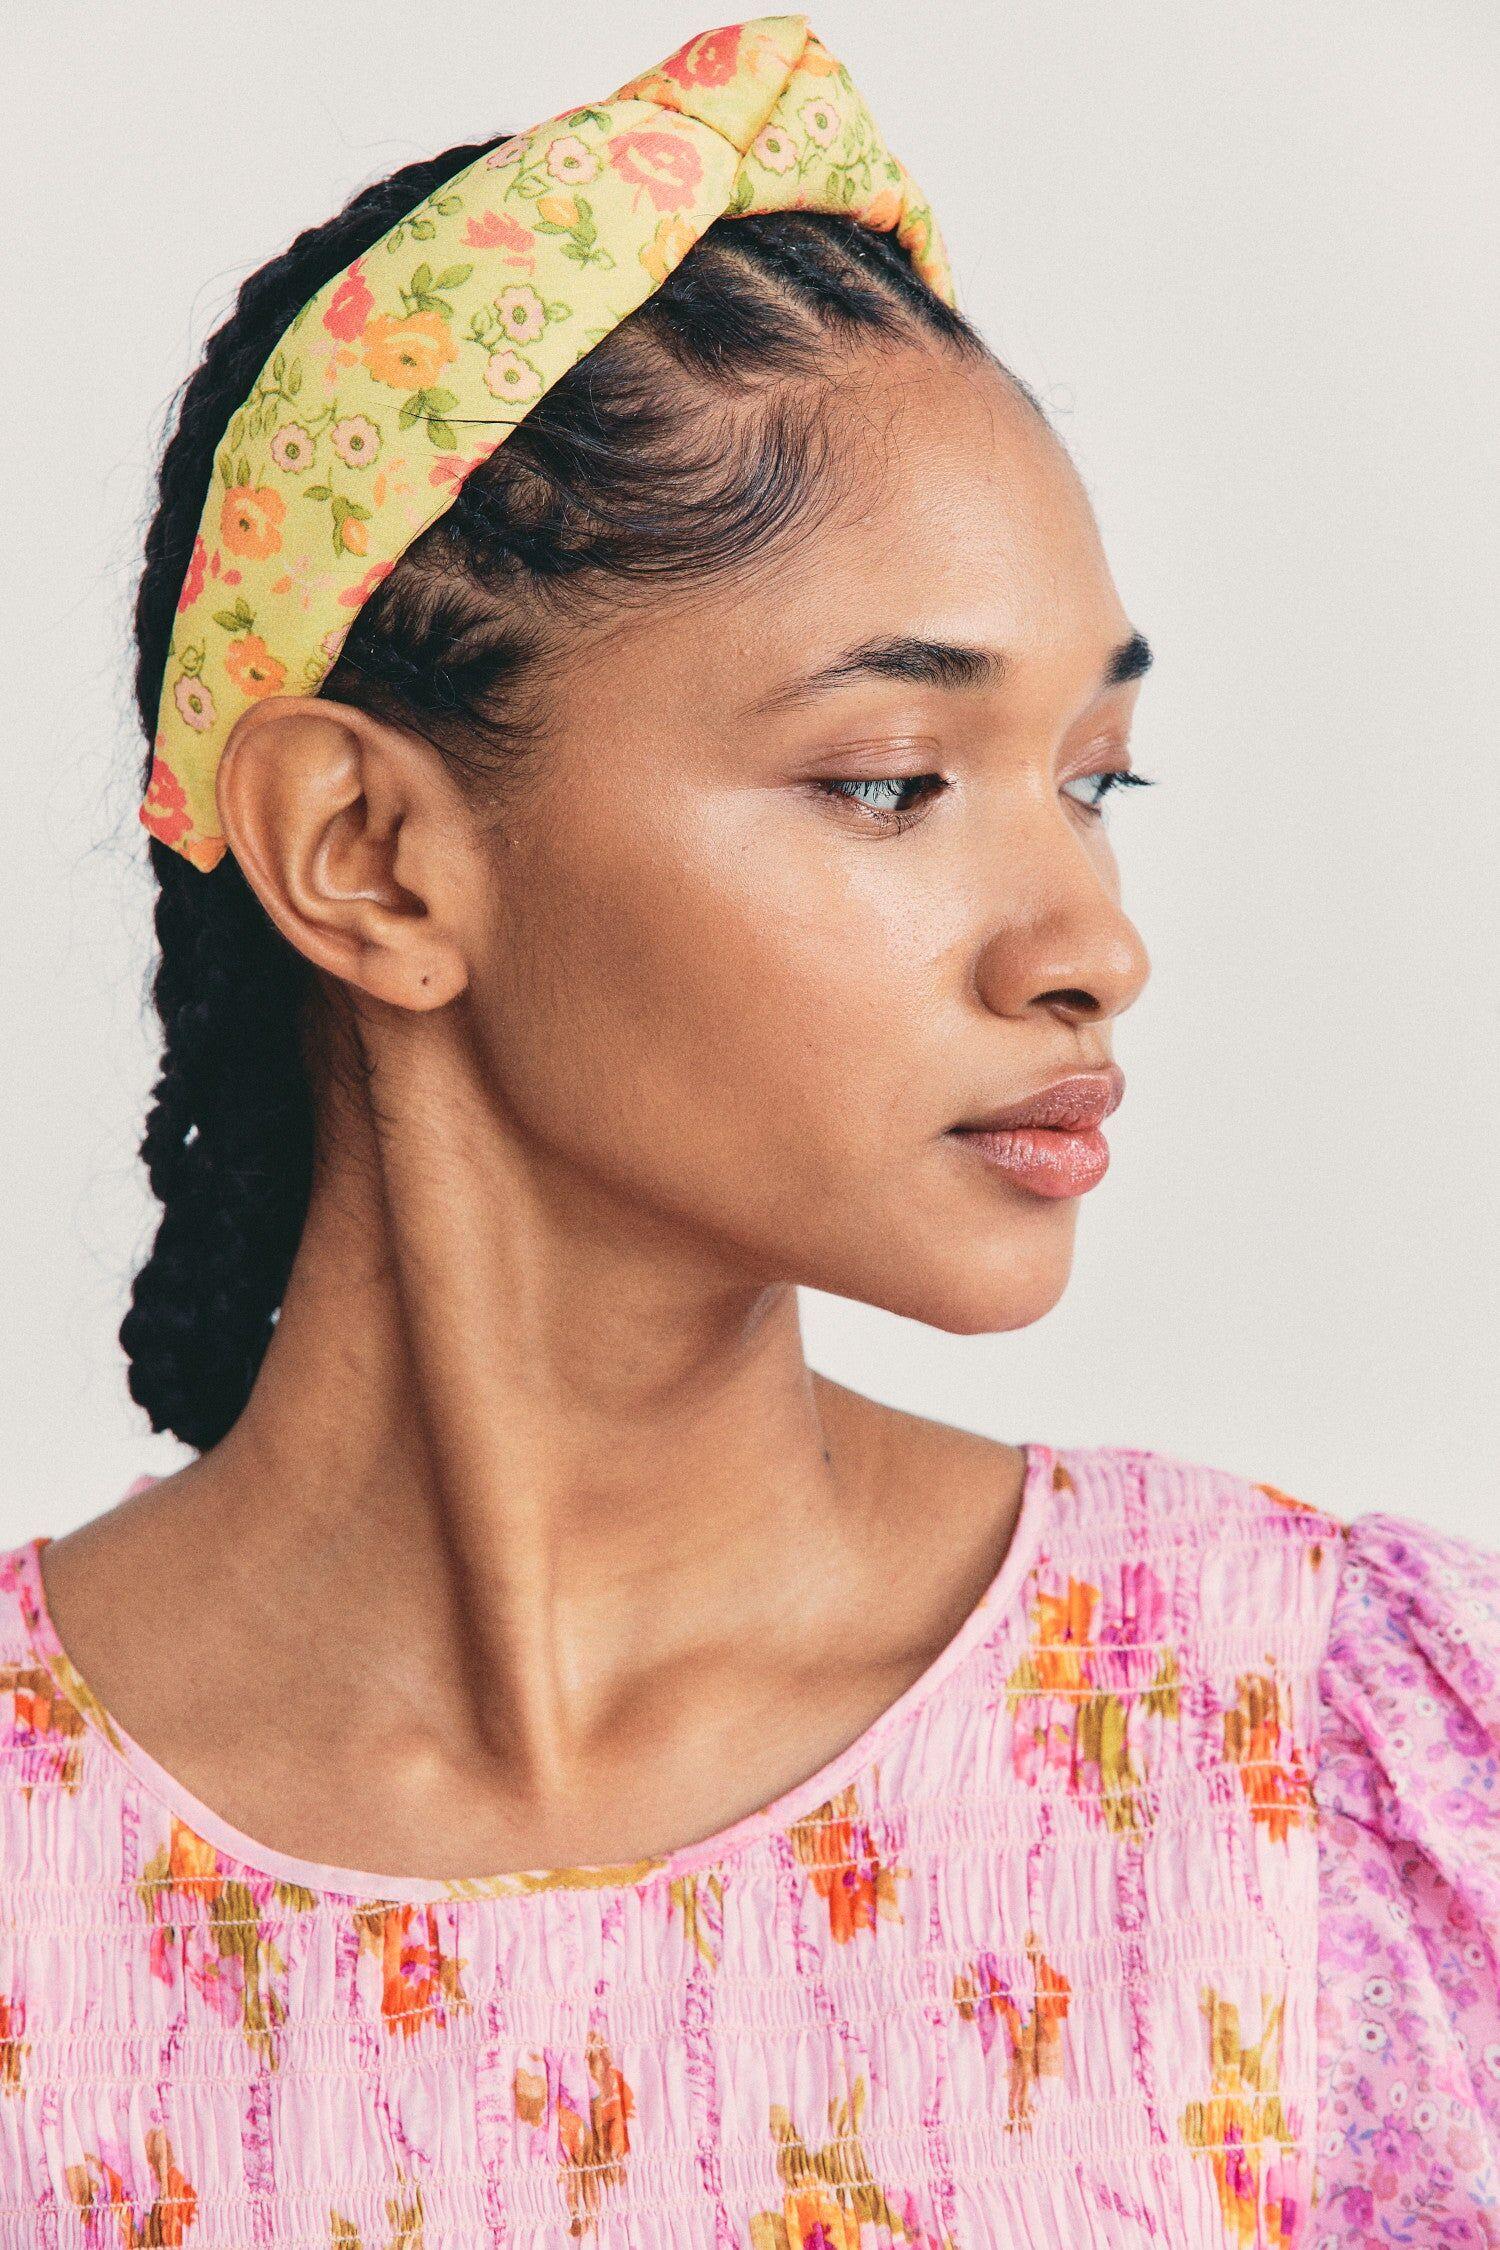 LELE SADOUGHI Women's LoveShackFancy x Lele Sadoughi Knotted Headband